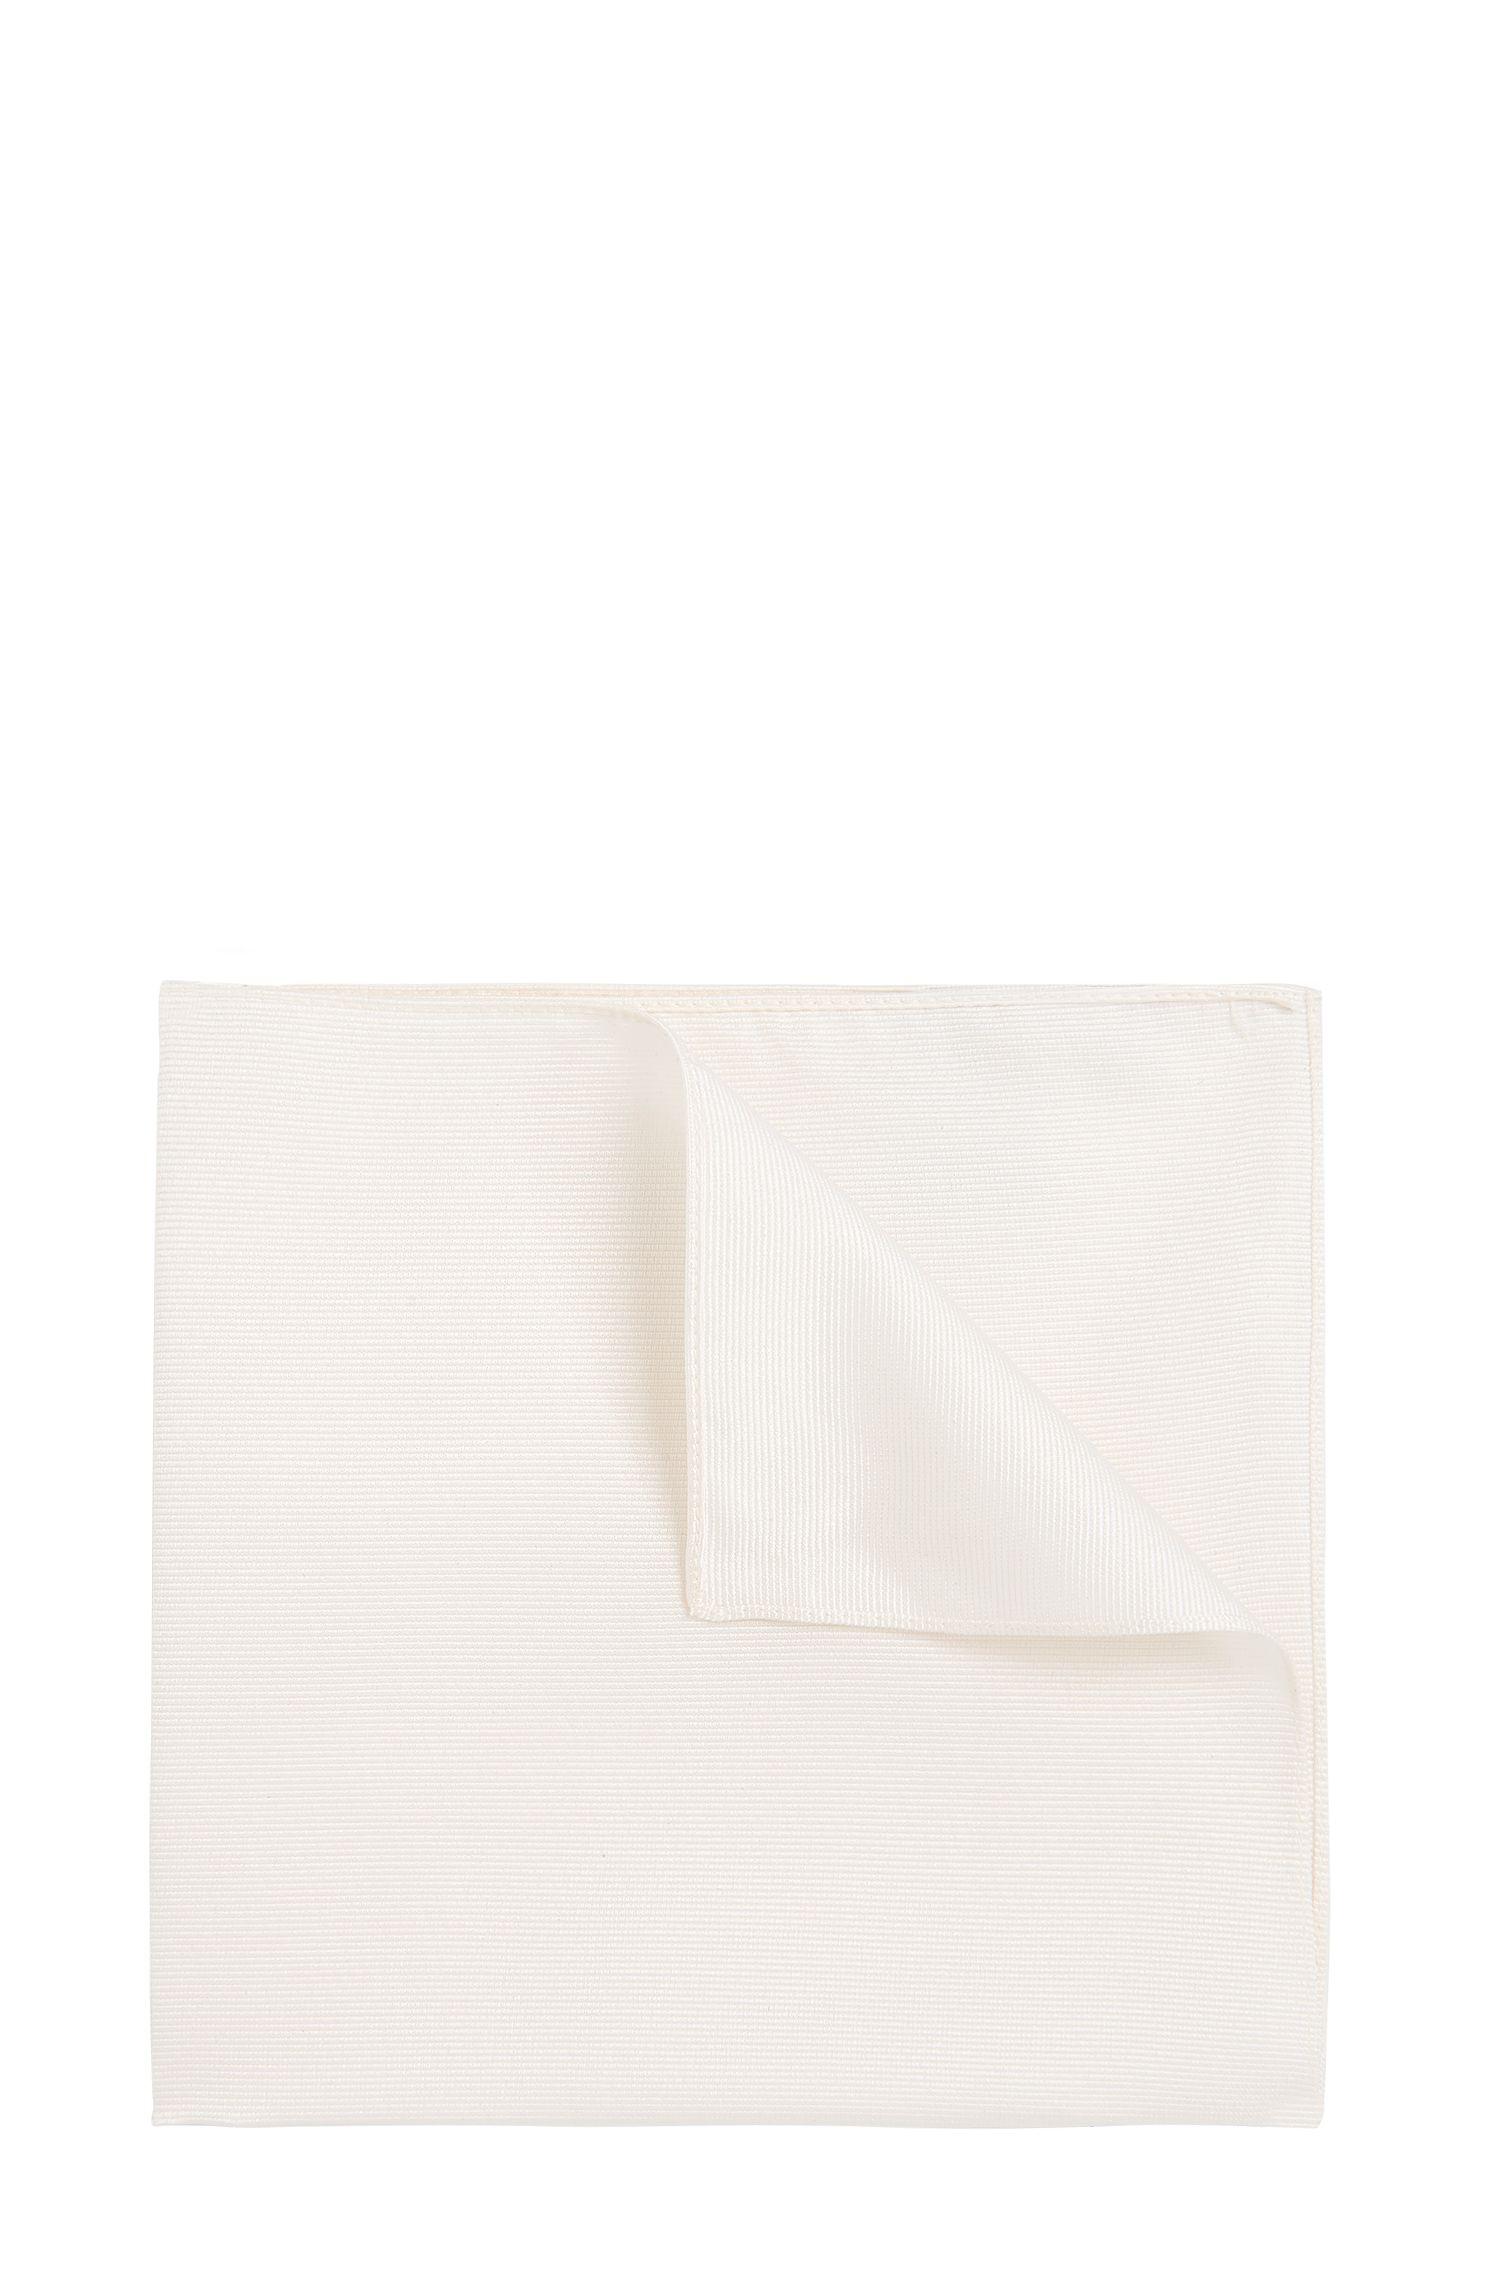 Effen pochet van zijde: 'Pocket sq. 33x33 cm', Naturel